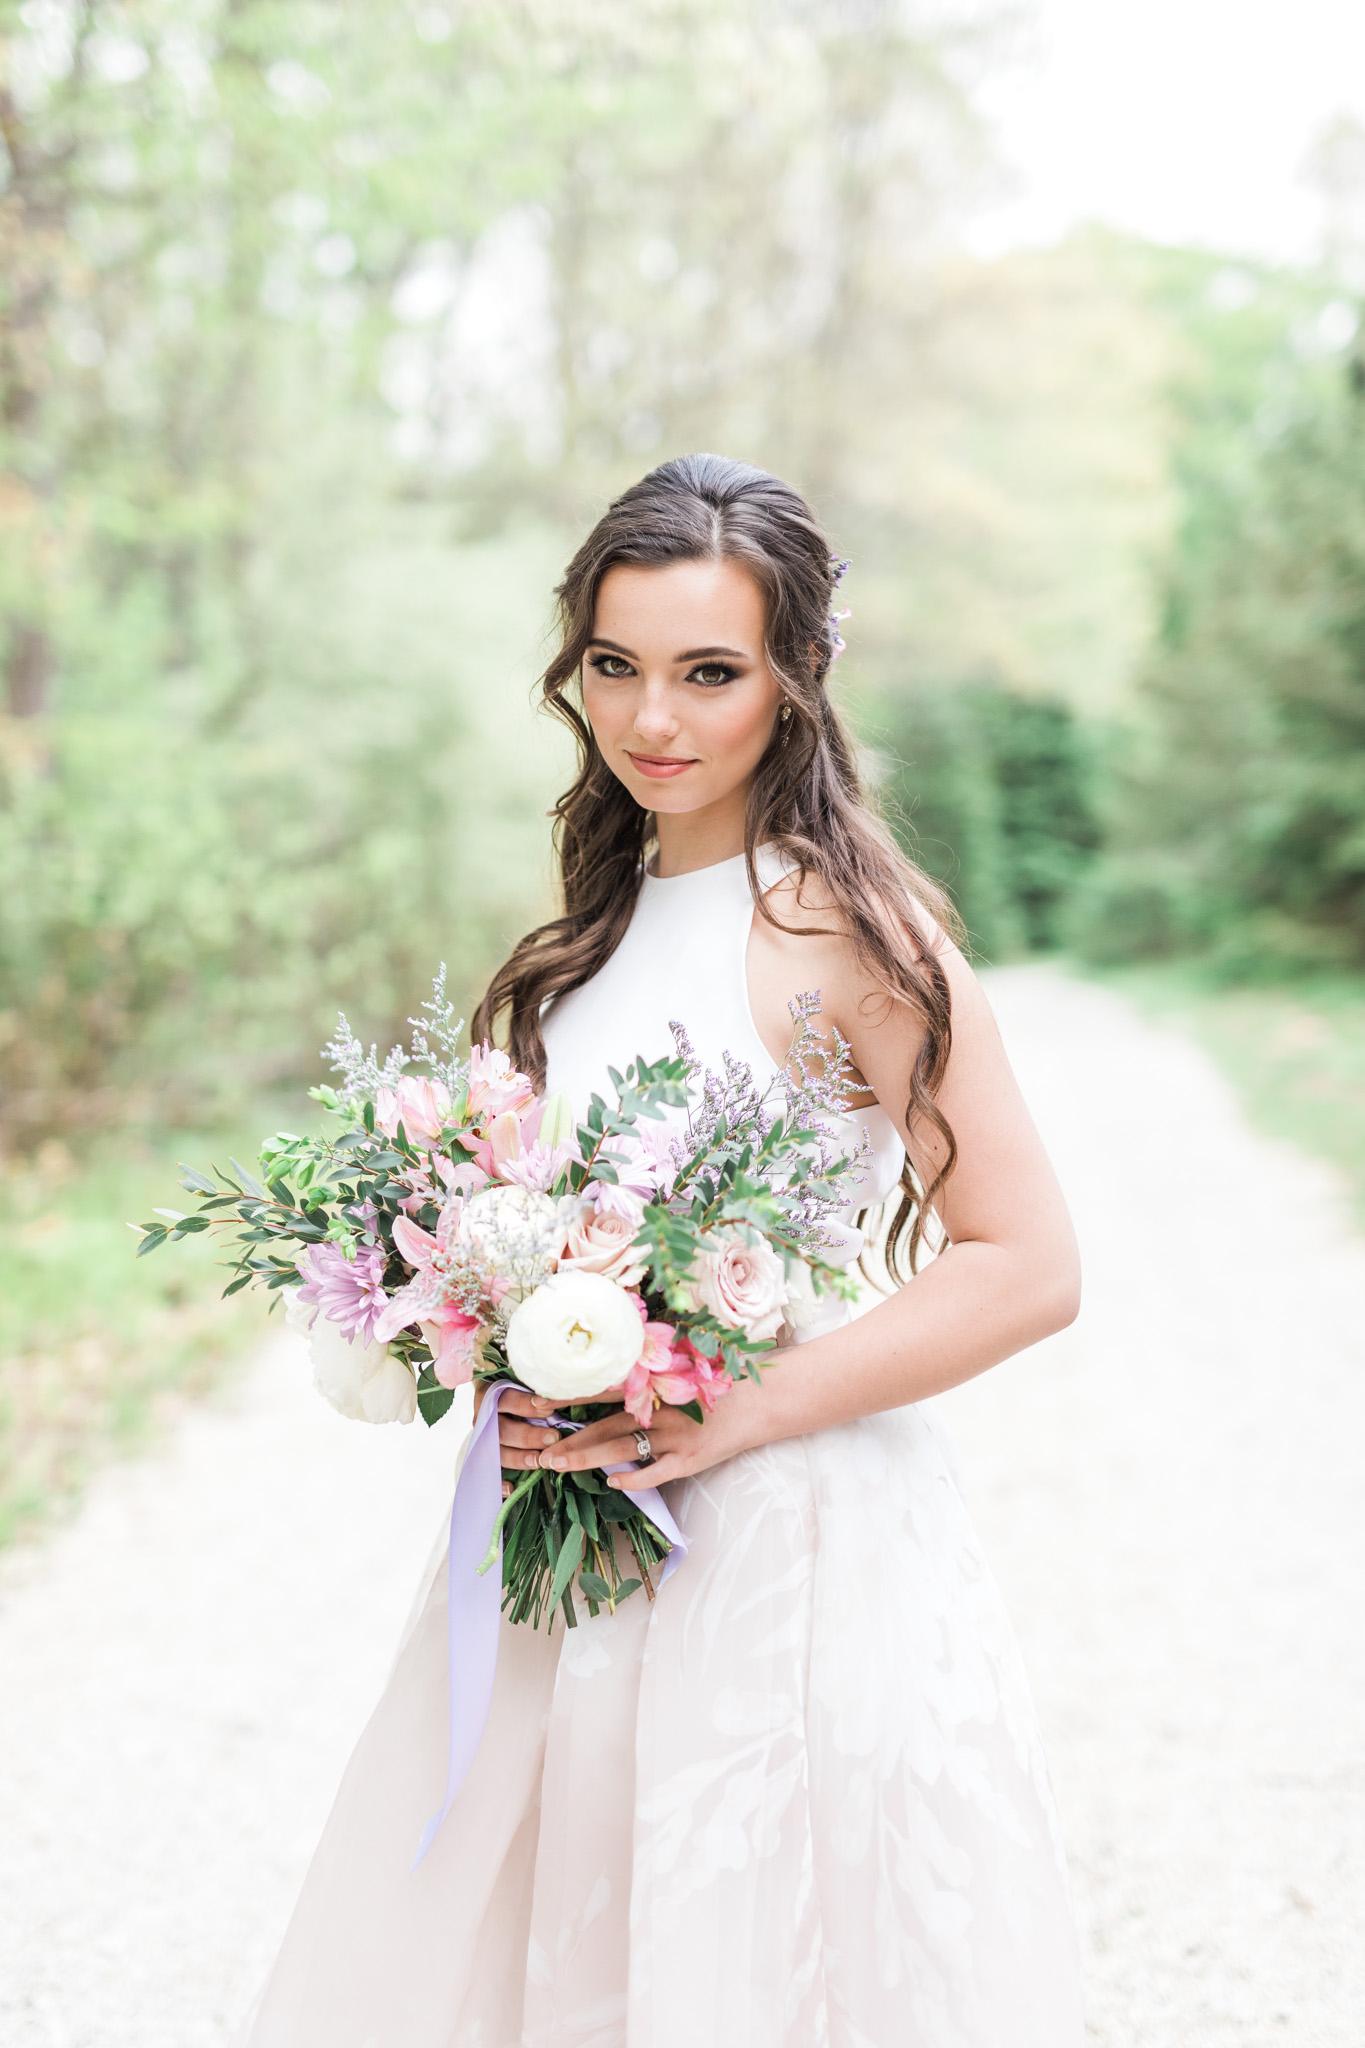 Bridal Portrait | Styled Wedding Shoot at Gable Hill Barn | Elegant Chic Wedding | Laurenda Marie Photography | West Michigan Wedding Photographer |